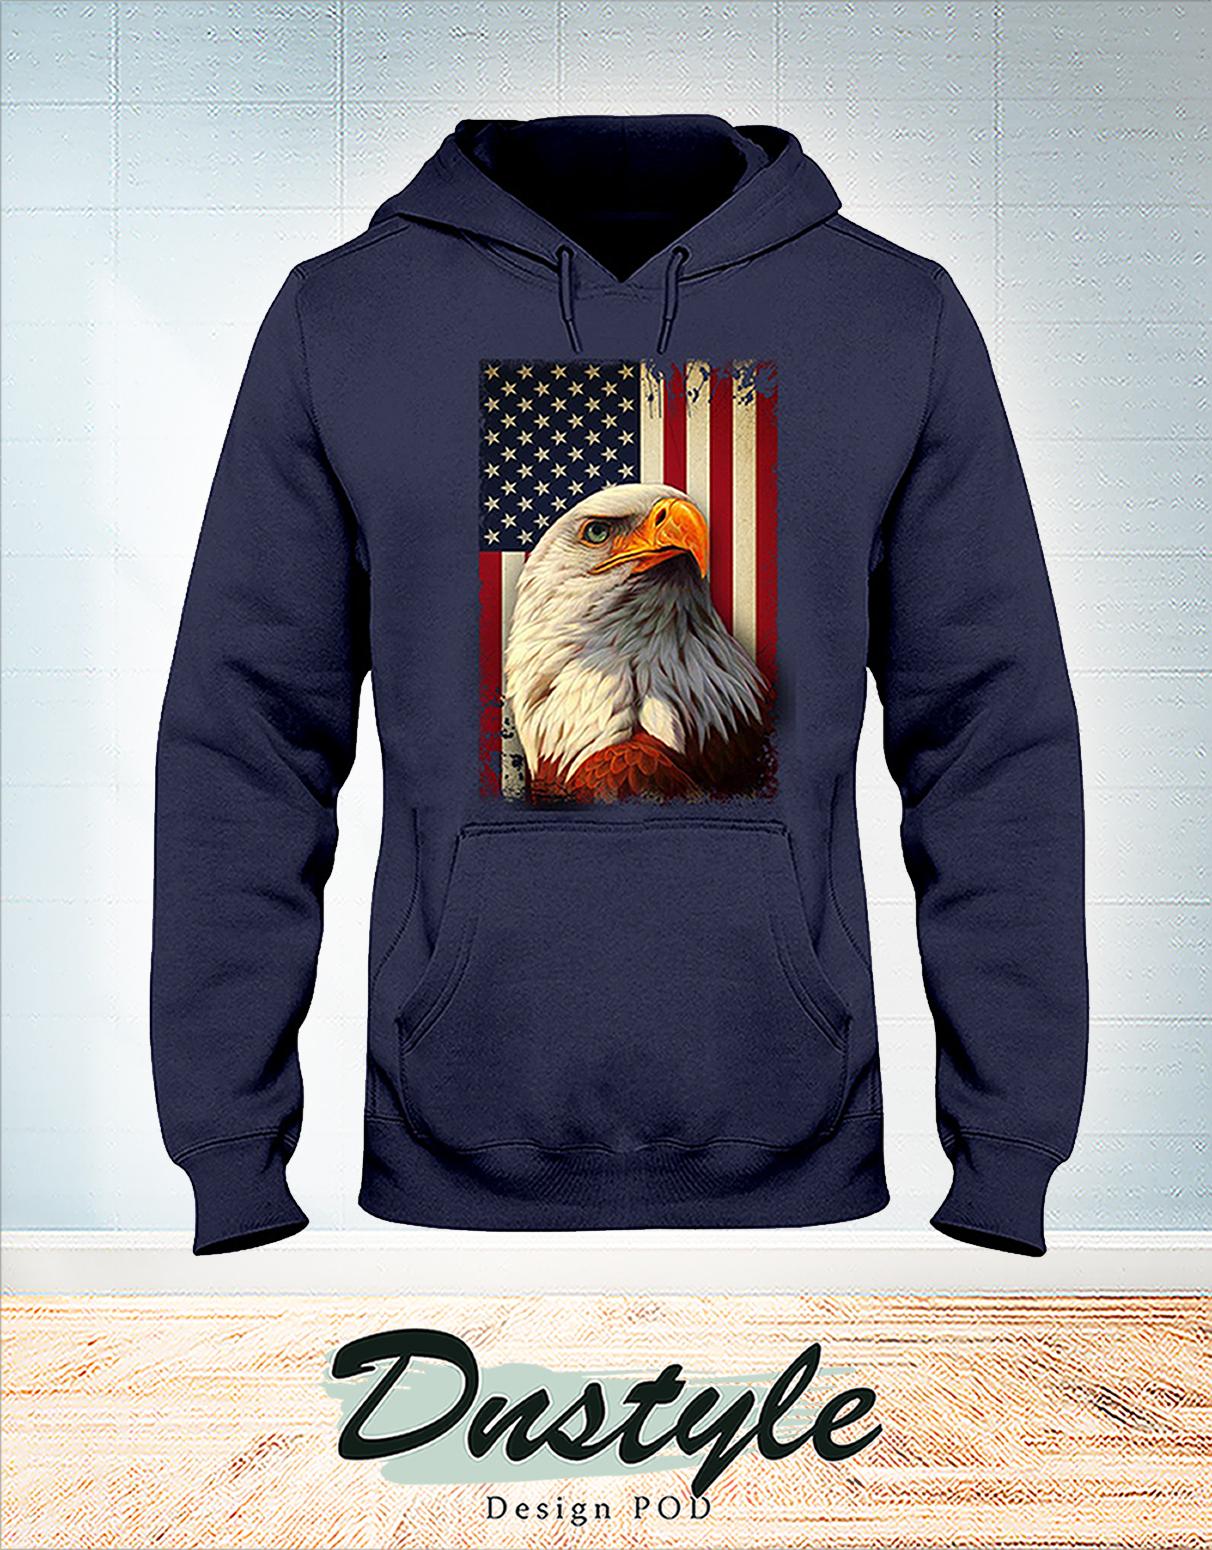 Eagle smile american flag 4th july hoodie